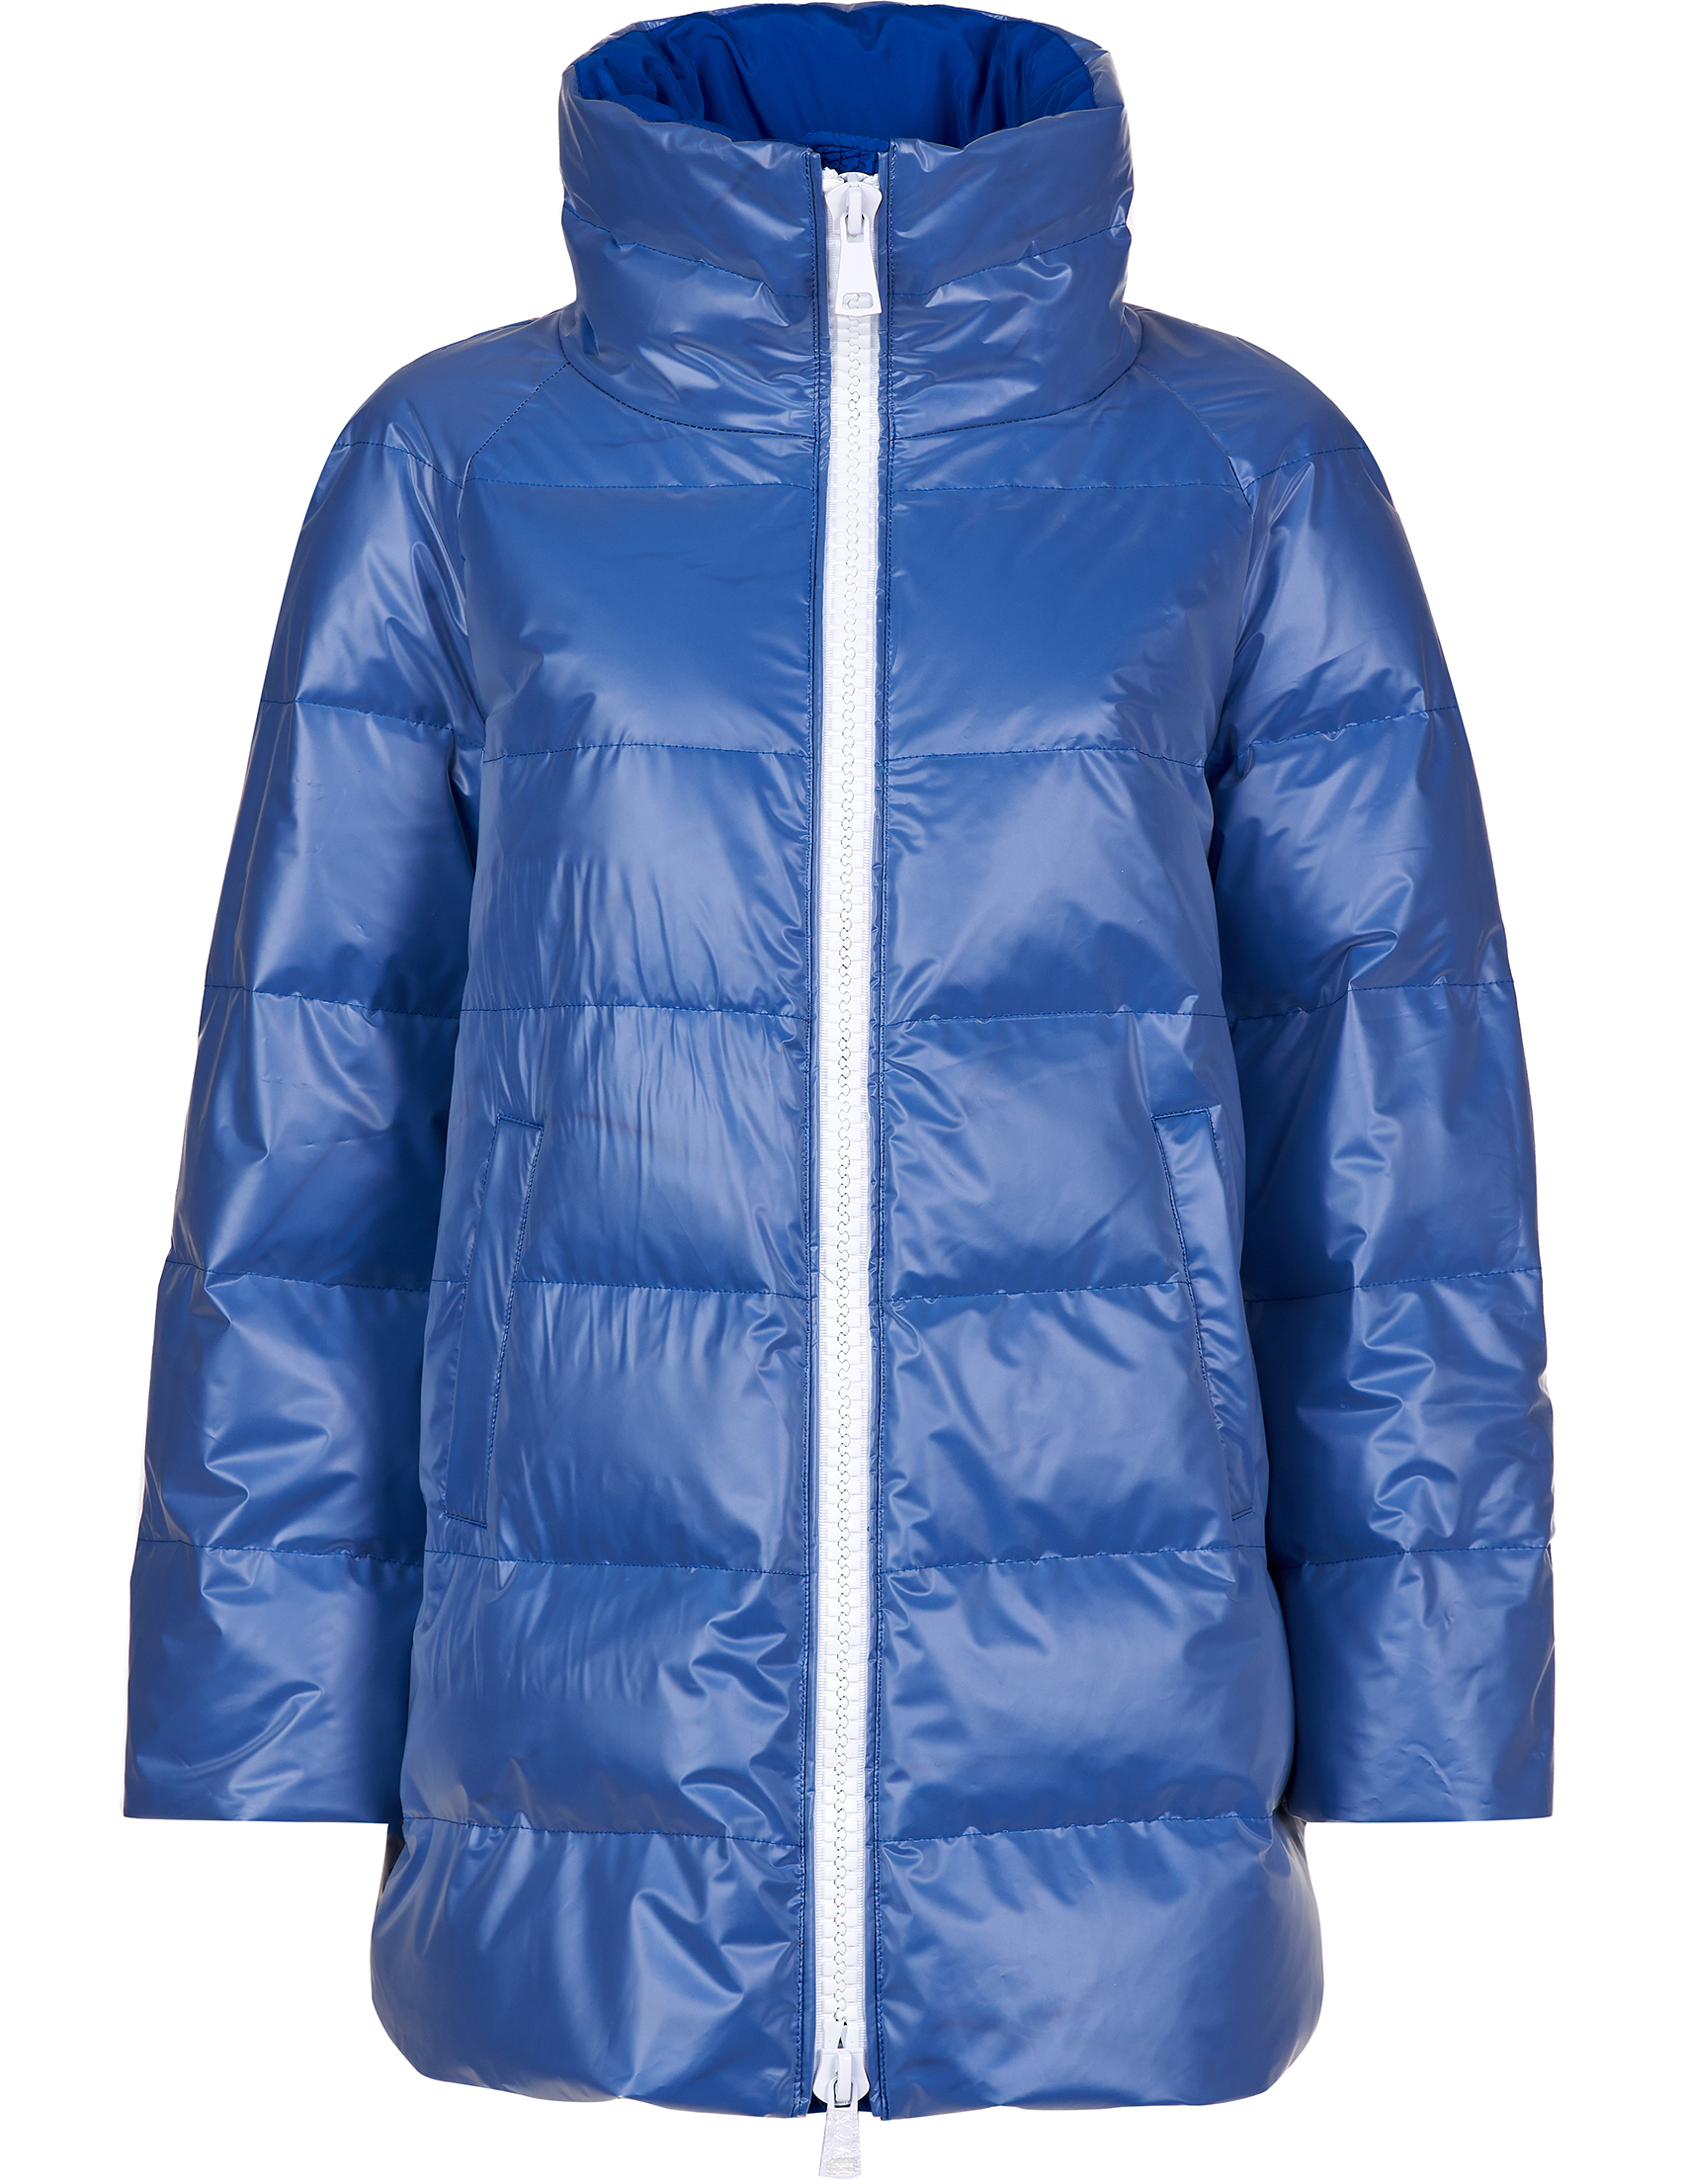 Купить Куртки, Куртка, GALLOTTI, Синий, 100%Полиуритан;100%Полиэстер;100%Полиамид, Осень-Зима